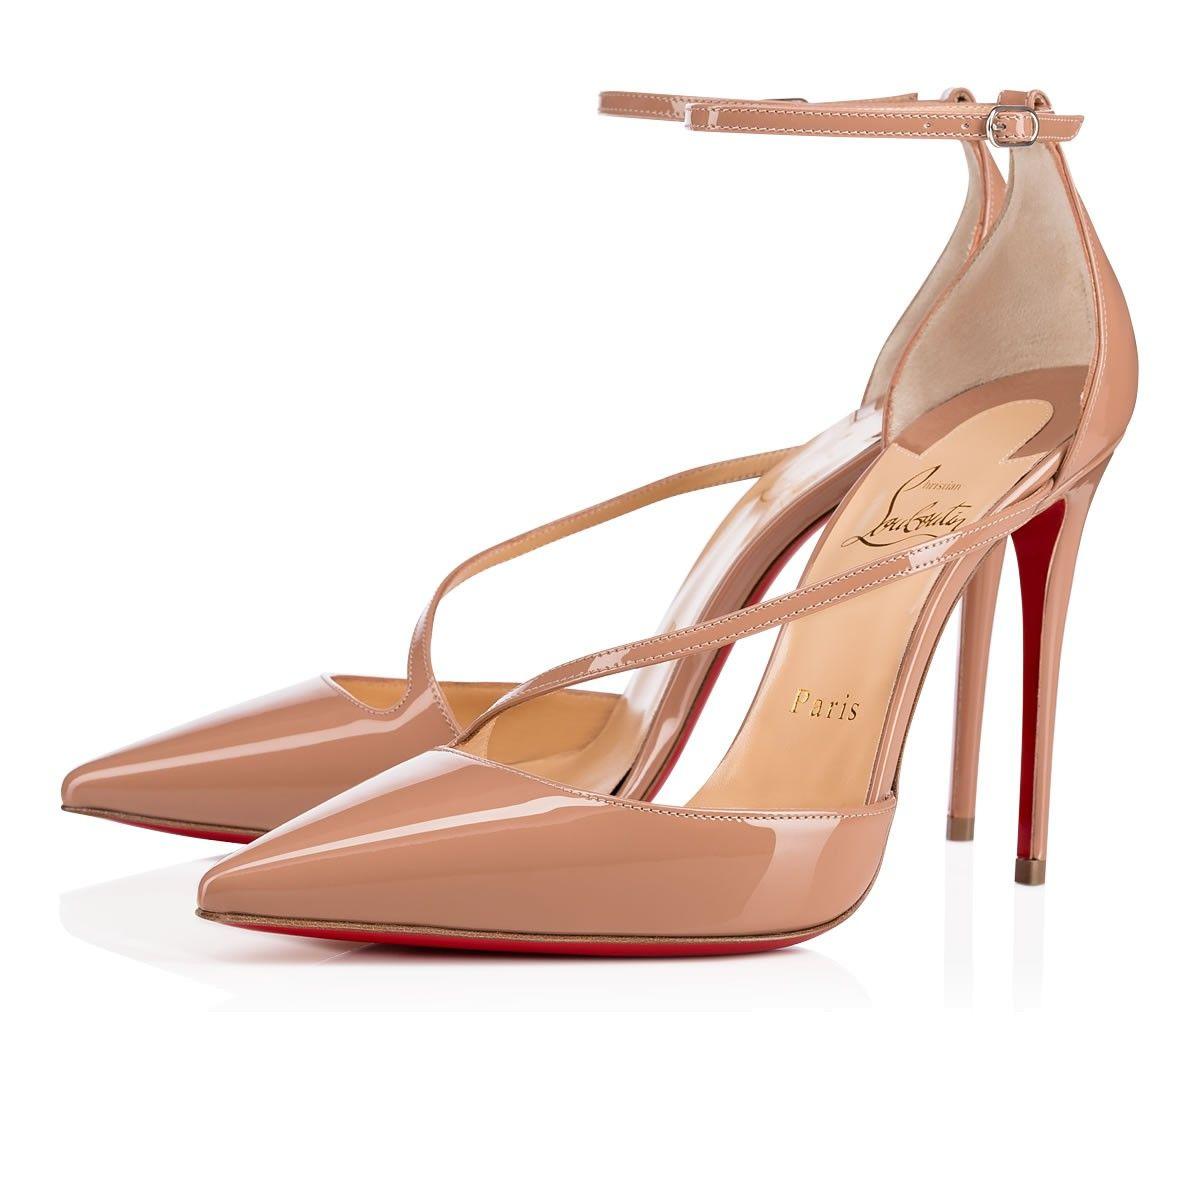 13c64814847 Fliketta 100 Nude Patent Leather - Women Shoes - Christian Louboutin ...